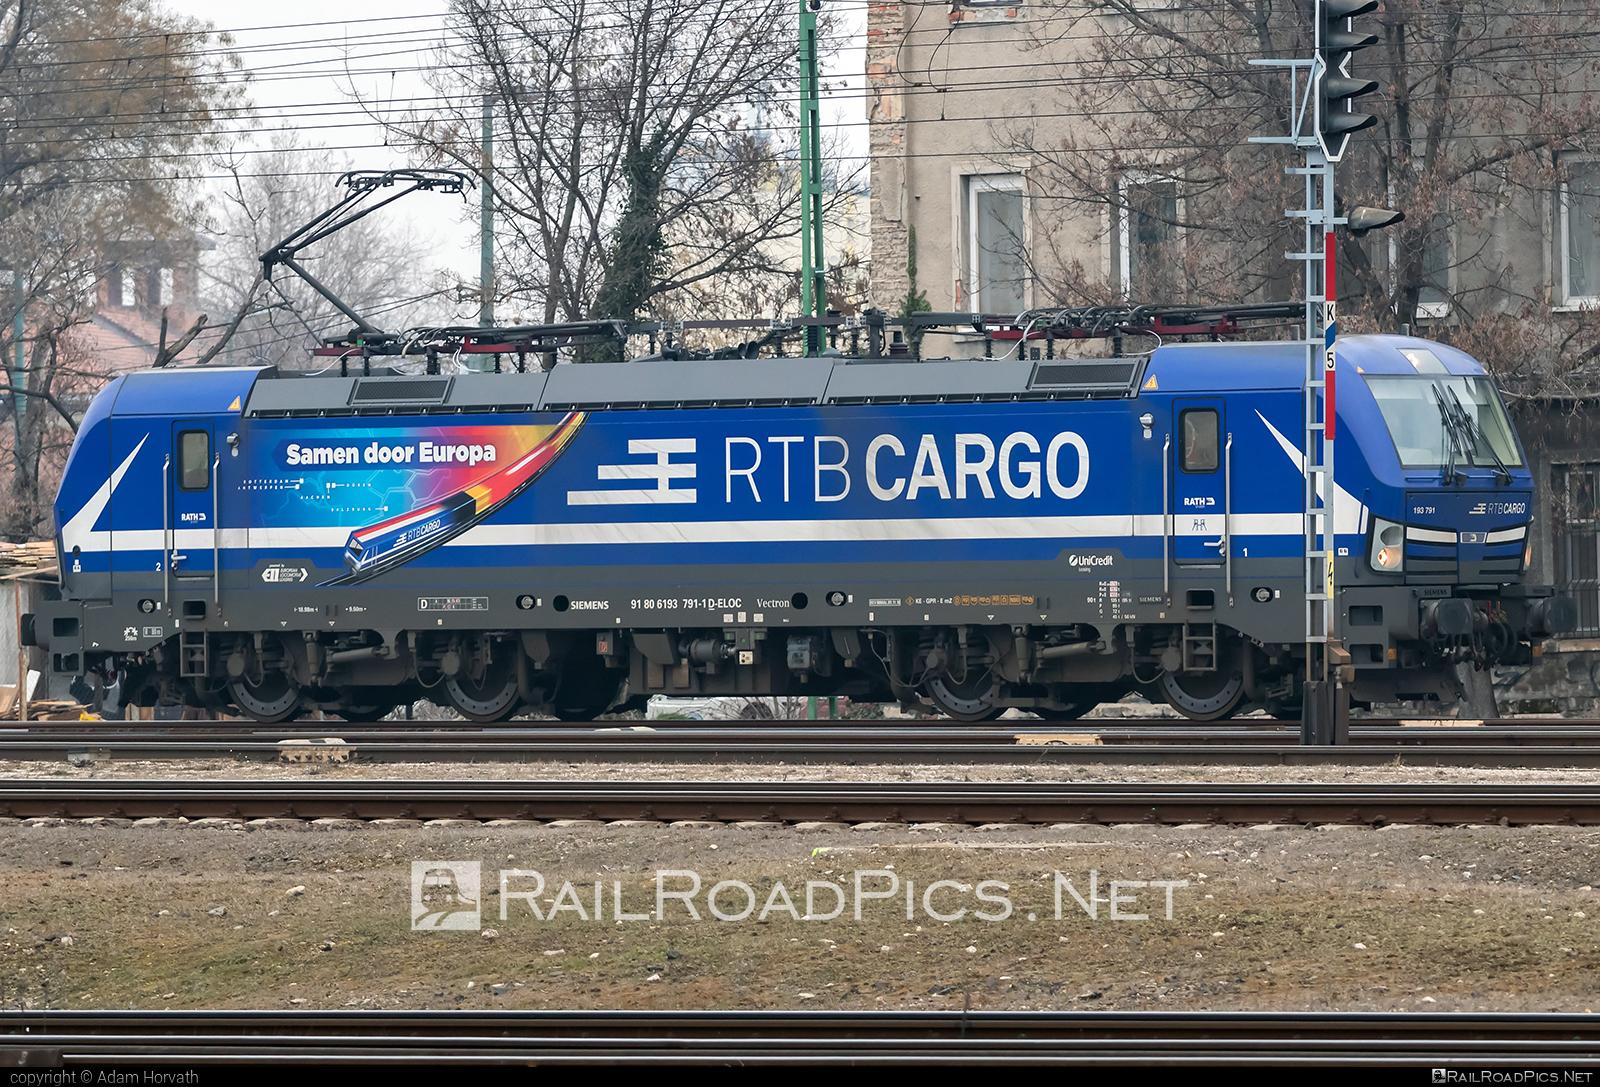 Siemens Vectron MS - 193 791 operated by RTB Cargo GmbH #ell #ellgermany #eloc #europeanlocomotiveleasing #rtb #siemens #siemensvectron #siemensvectronms #vectron #vectronms